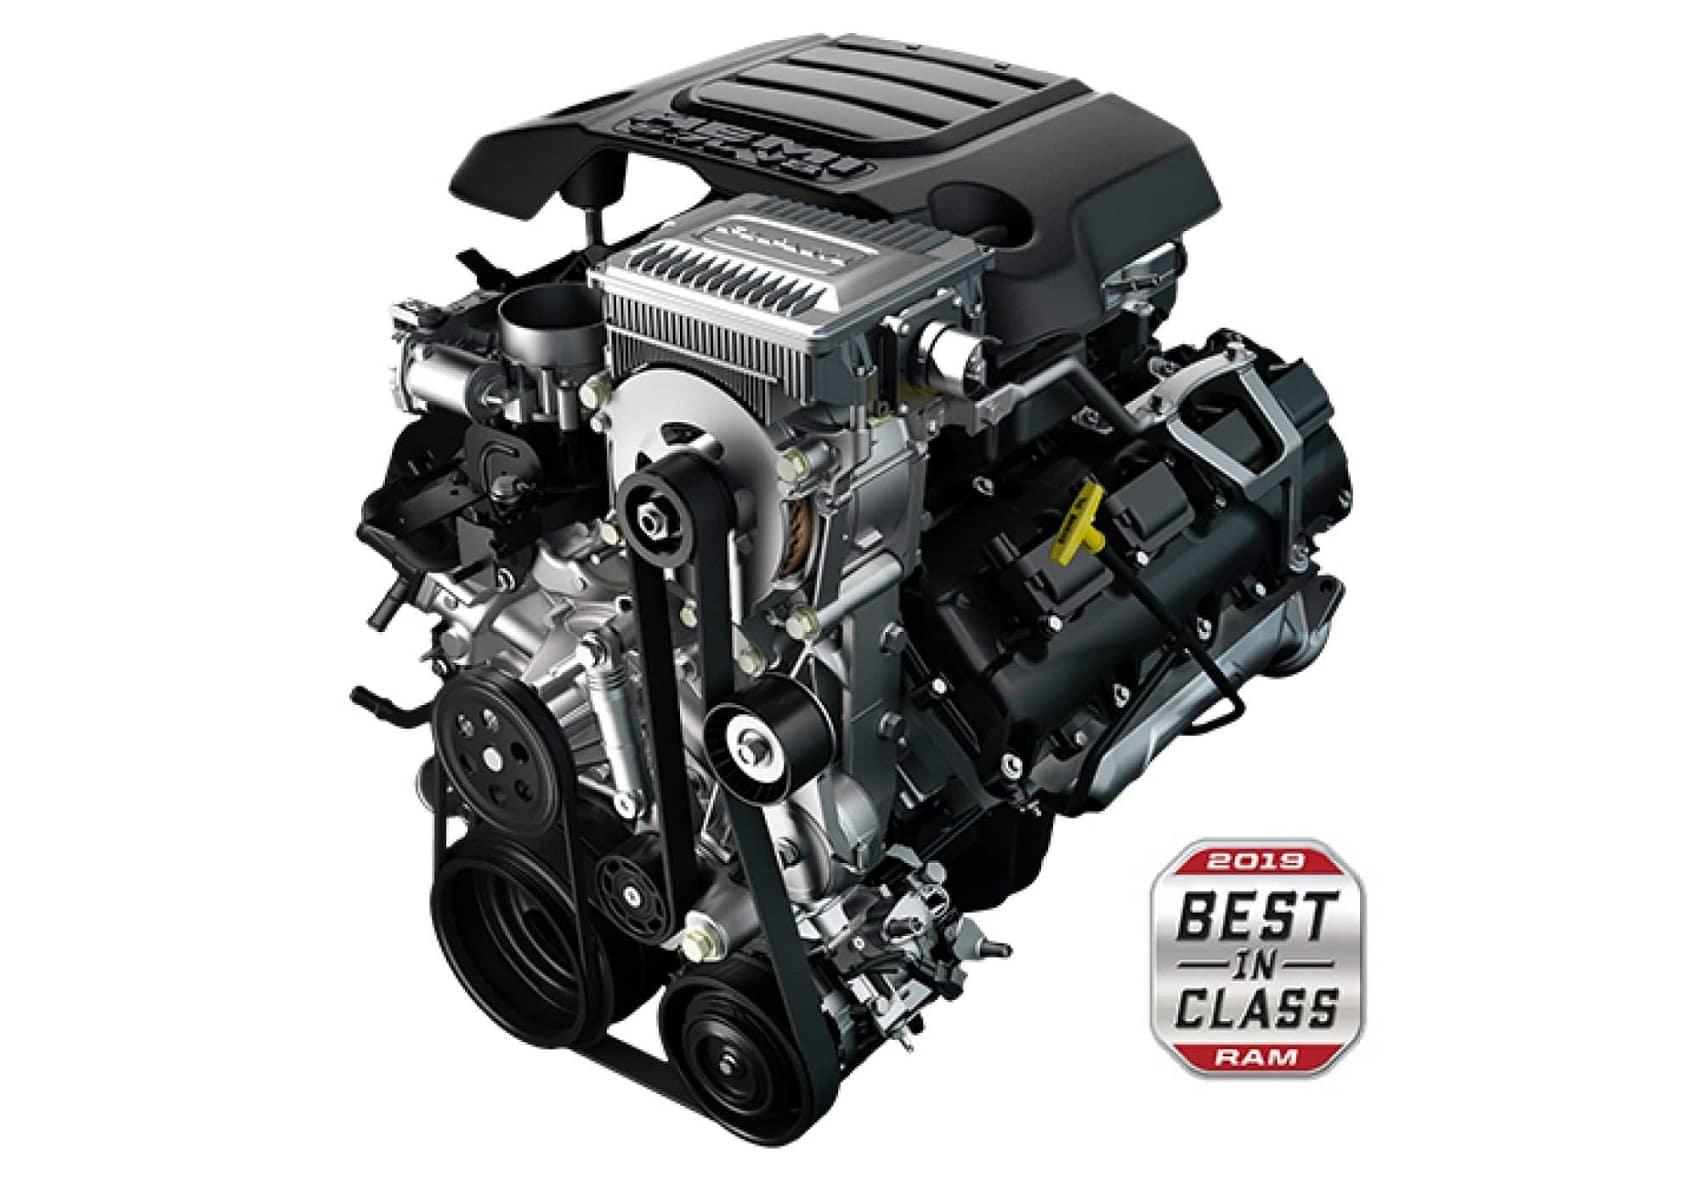 5.7L HEMI V8 w eTorque Chicago, IL